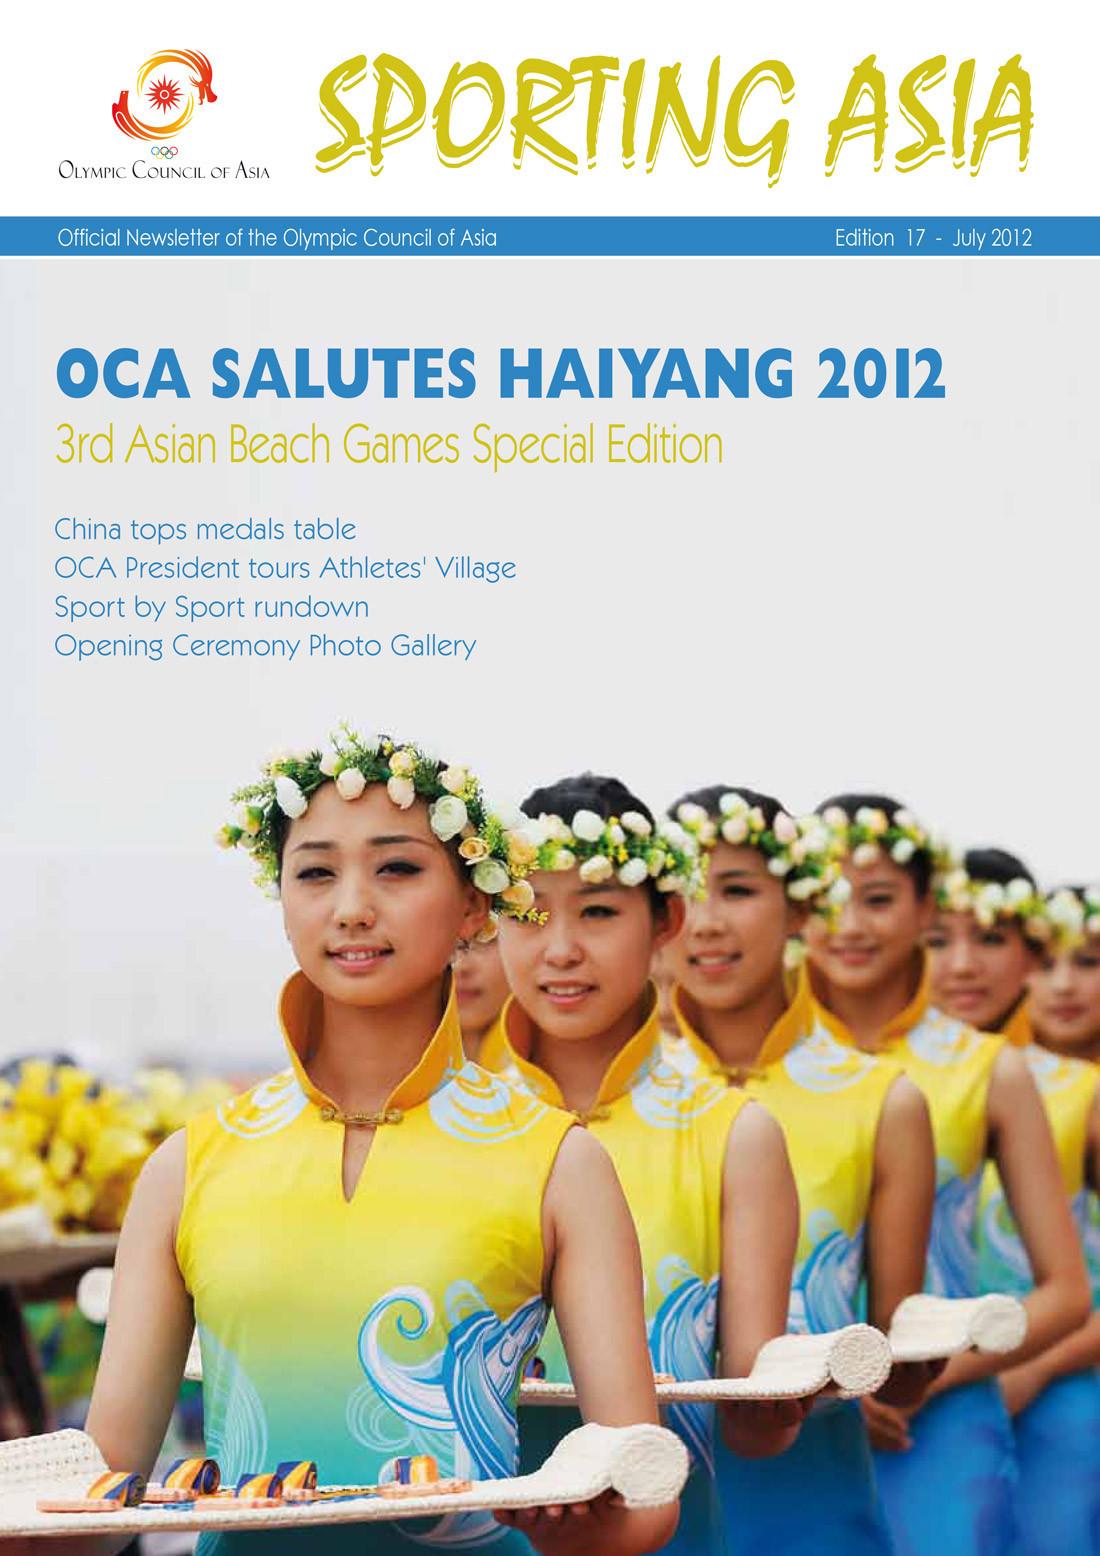 Sporting Asia - Edition 17 - JUL 2012